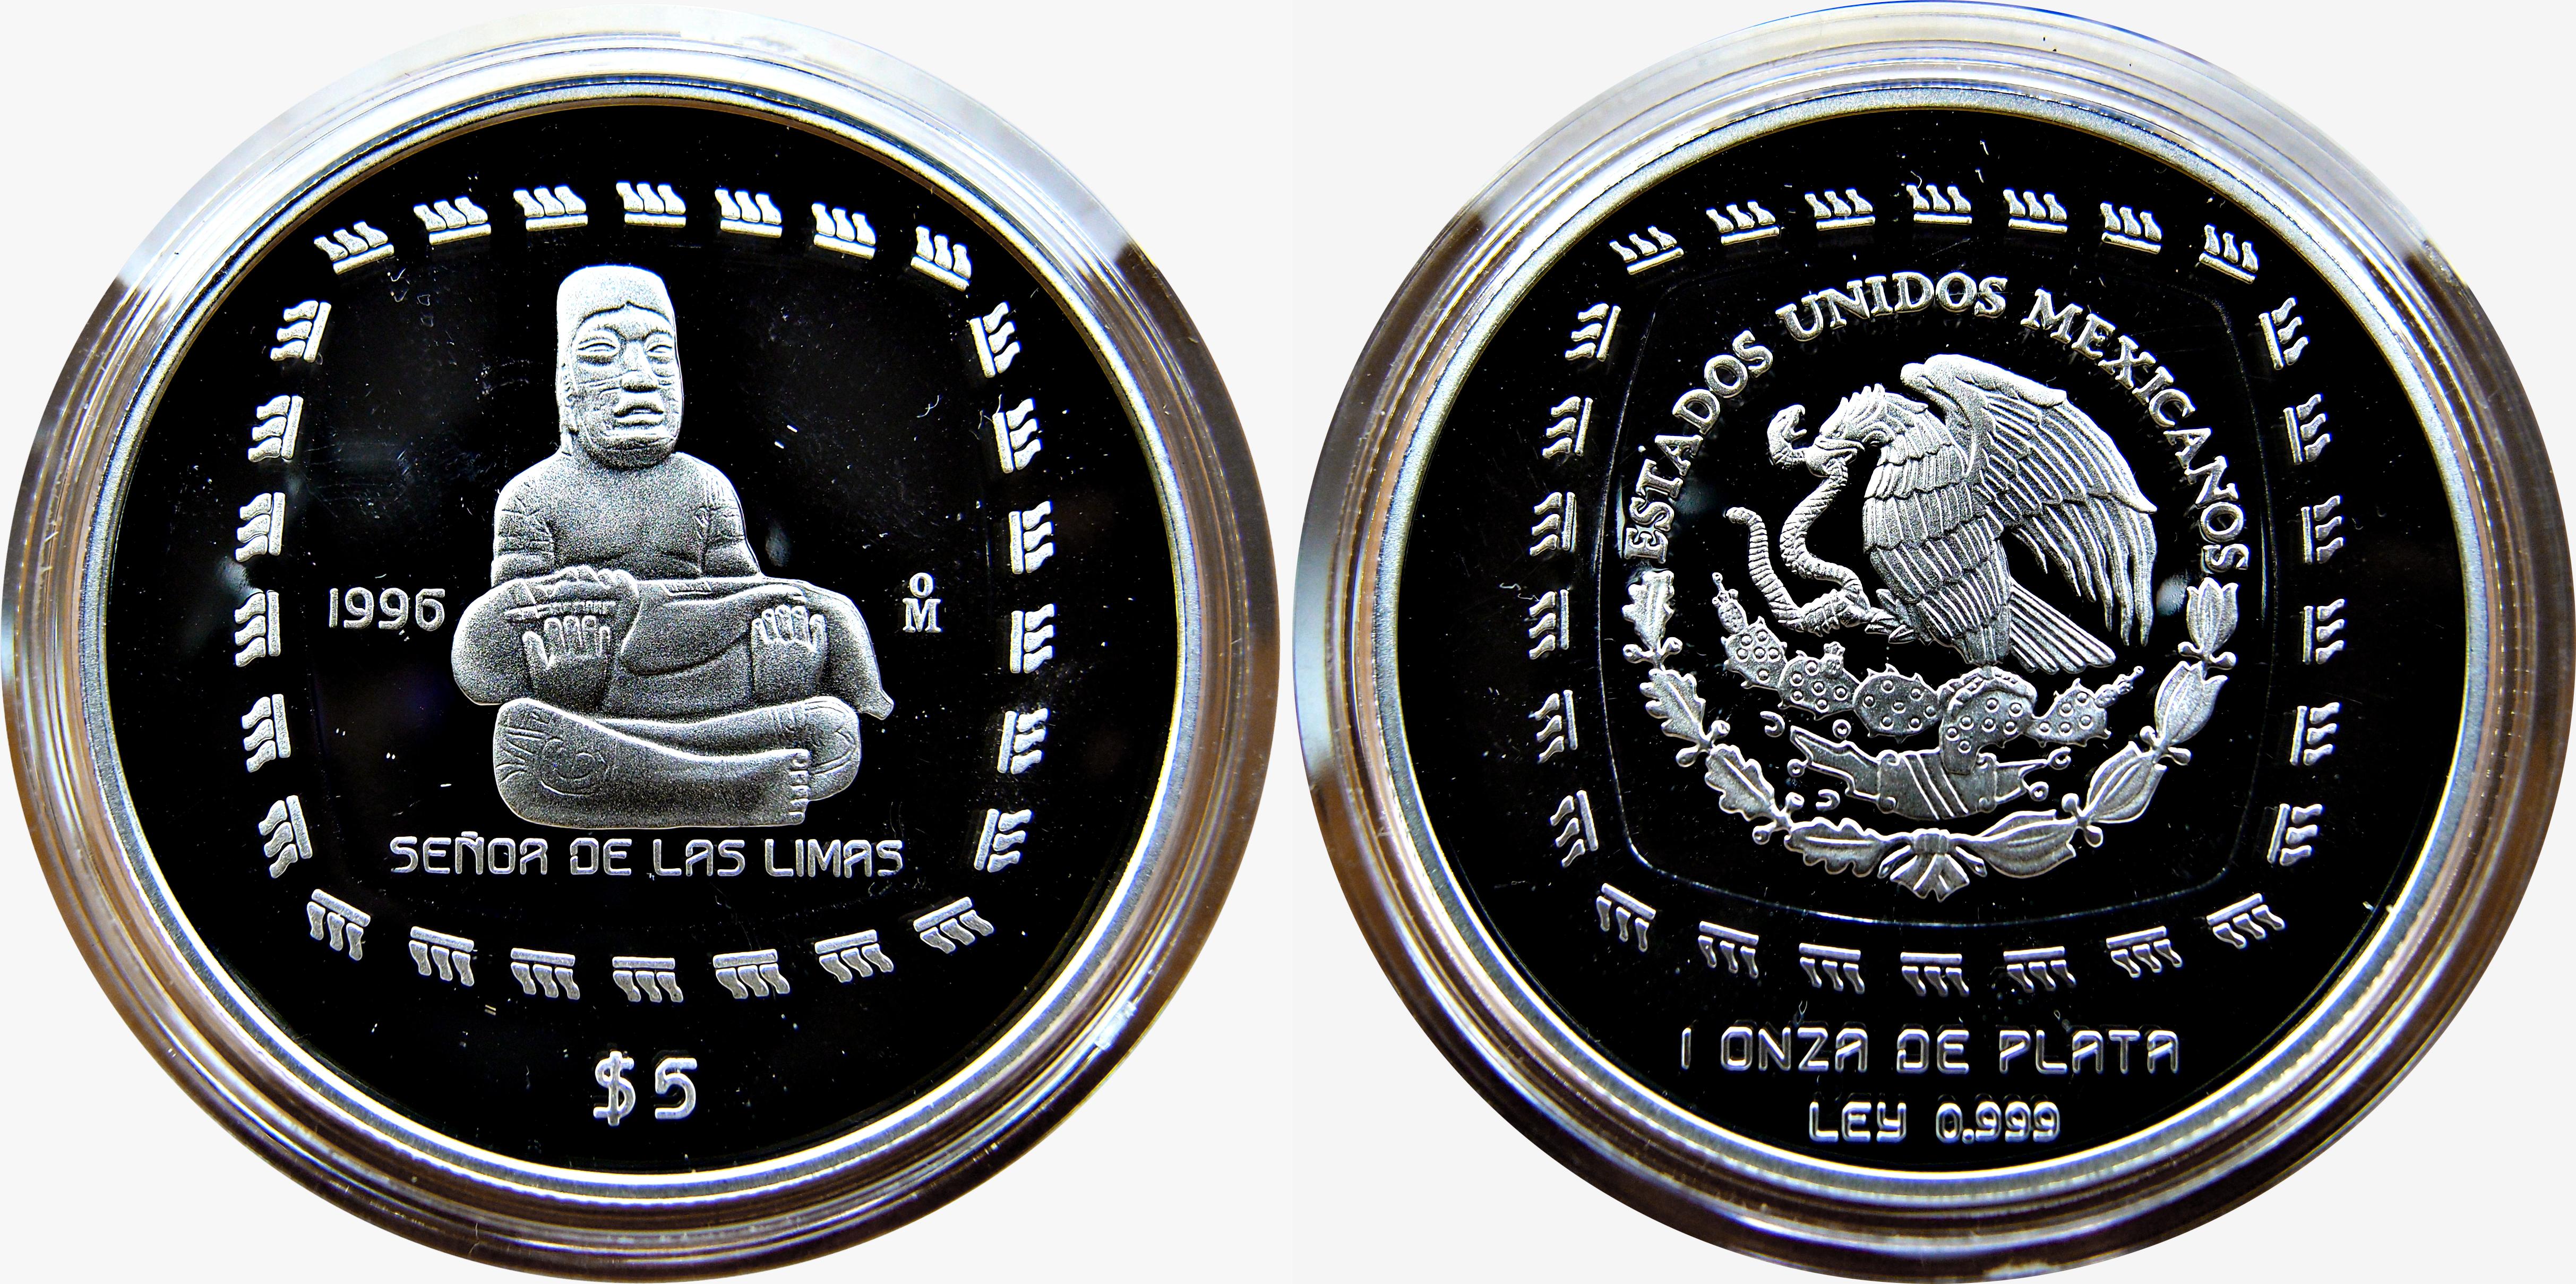 Colección Precolombina de onzas de plata del Banco de Mexico 12123648435_363e4bcc81_o